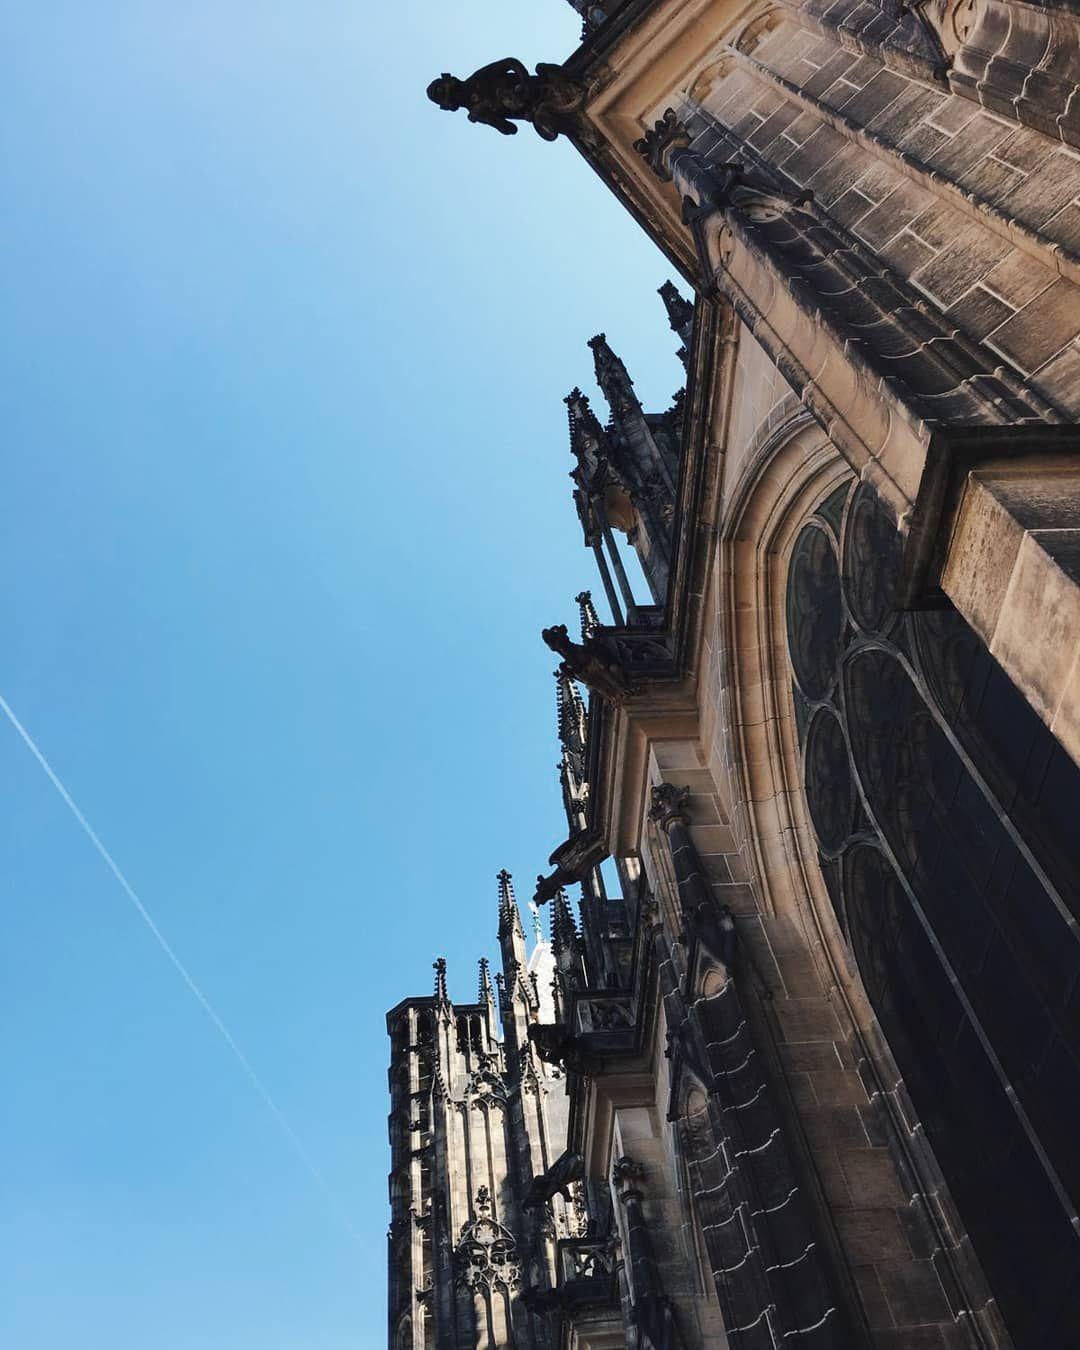 #monuments #architecture #travel #europe #ig #photography #art #history #photo #photooftheday  #monuments #architecture #travel #europe #ig #photography #art #history #photo #photooftheday #instatravel #travelphotography #czechrepublic #prague #praha #architecturephotography #sculptures #beautiful #cathedral #sky #blue #bluesky #building